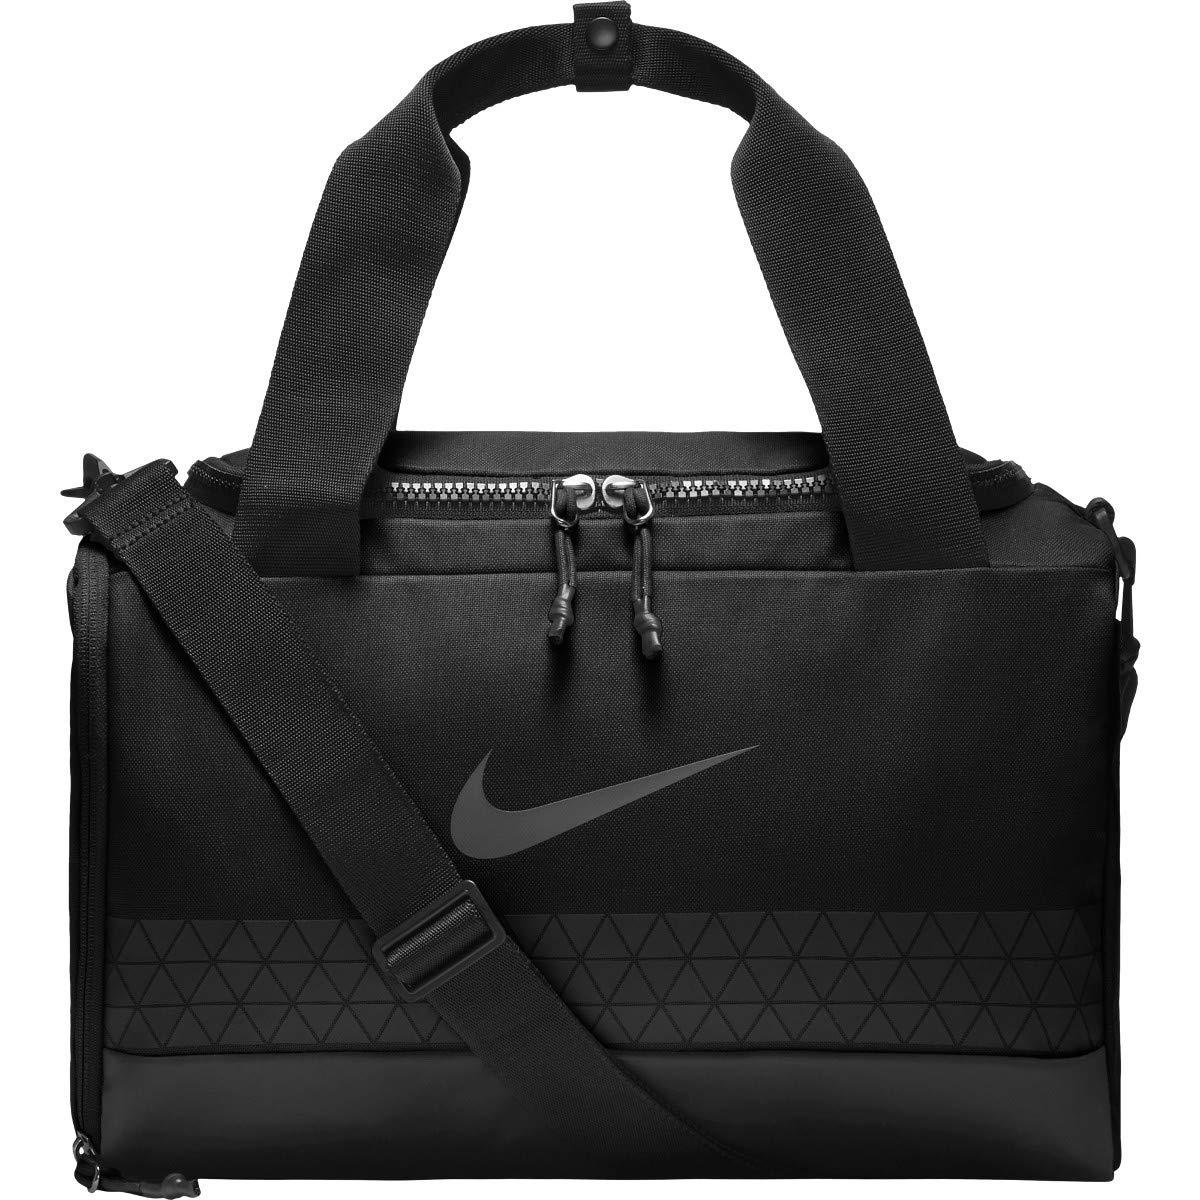 Nike 2018 Sac de Sport Grand Format, 45 cm, 3 liters, Multicolore (Negro/Azul) BA5545